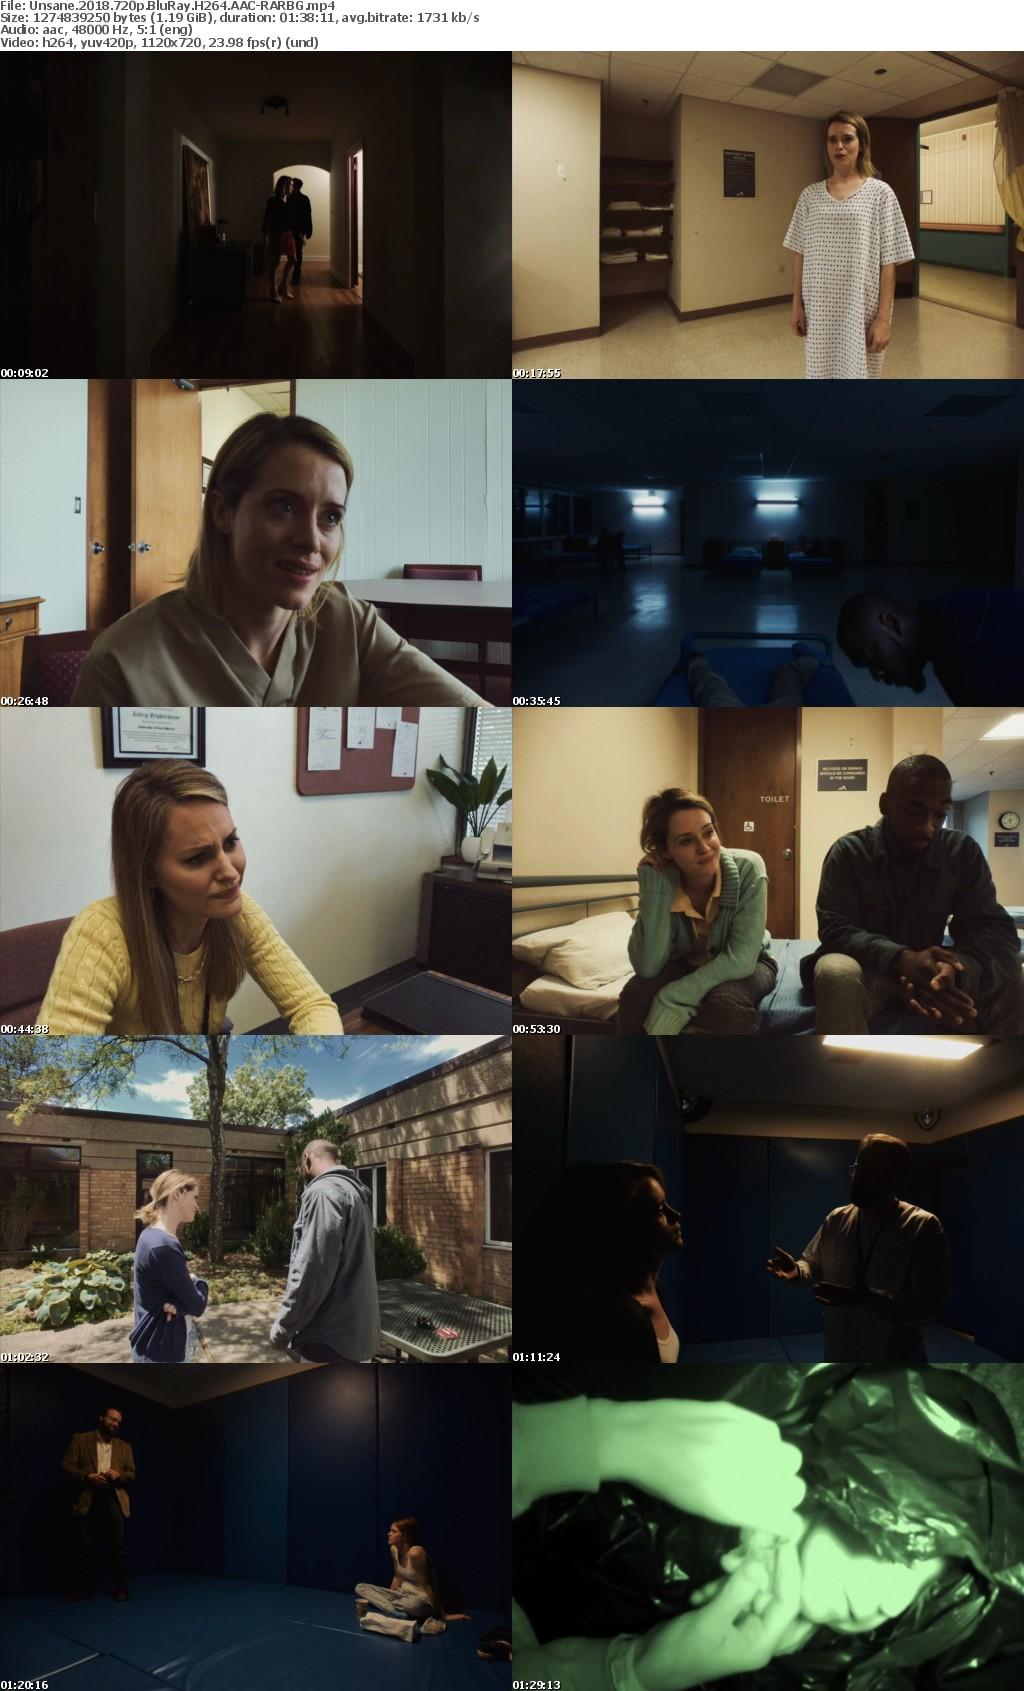 Unsane (2018) 720p BluRay H264 AAC-RARBG